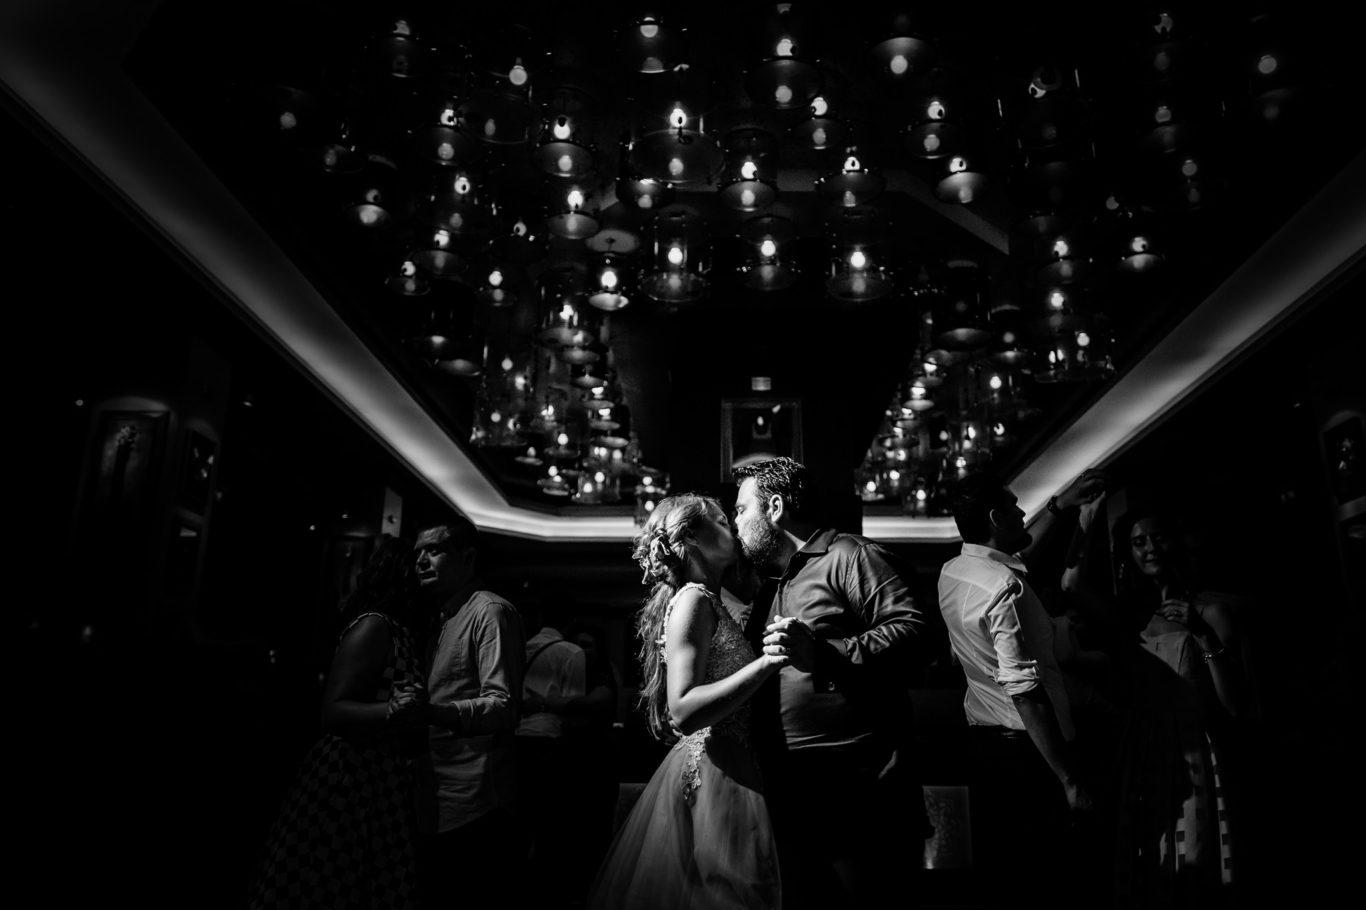 0757-fotografie-nunta-bucuresti-rodica-rares-fotograf-ciprian-dumitrescu-dc1_0676